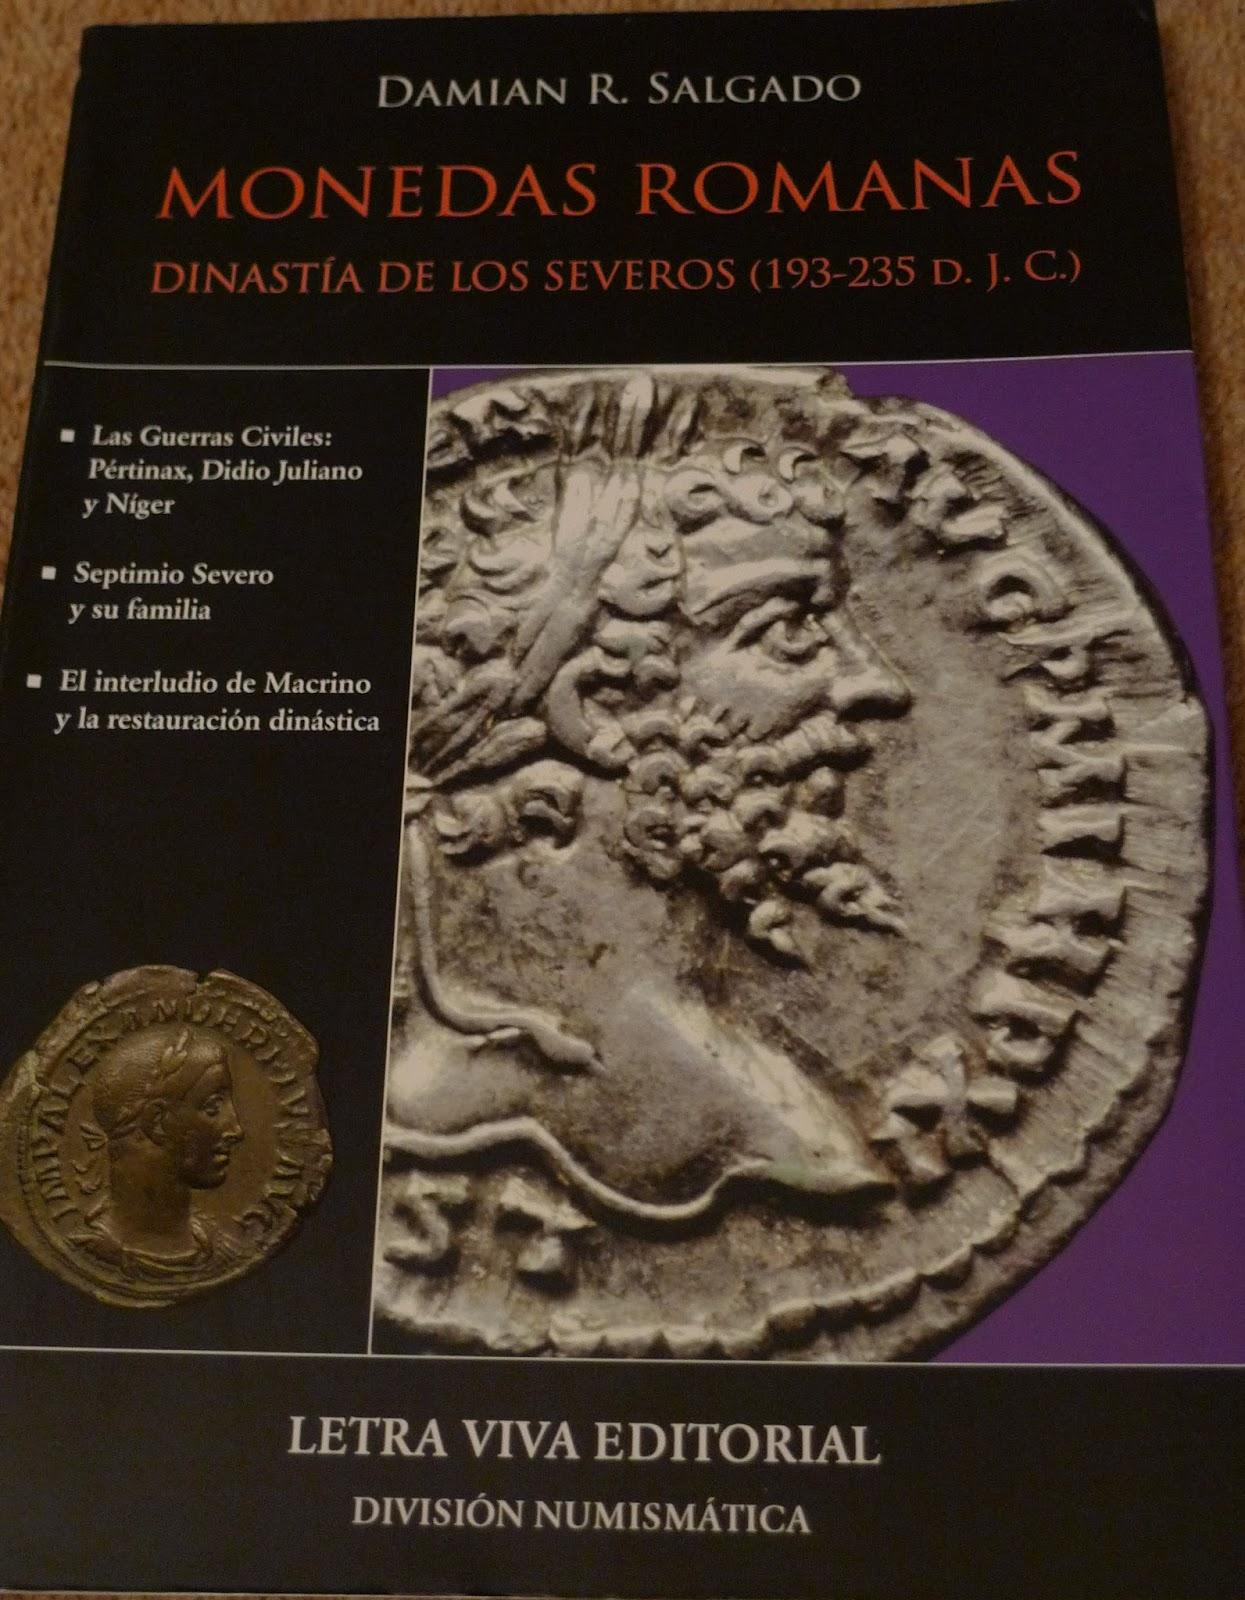 Glosario de monedas romanas. DOBLE CENTENIONAL. 84